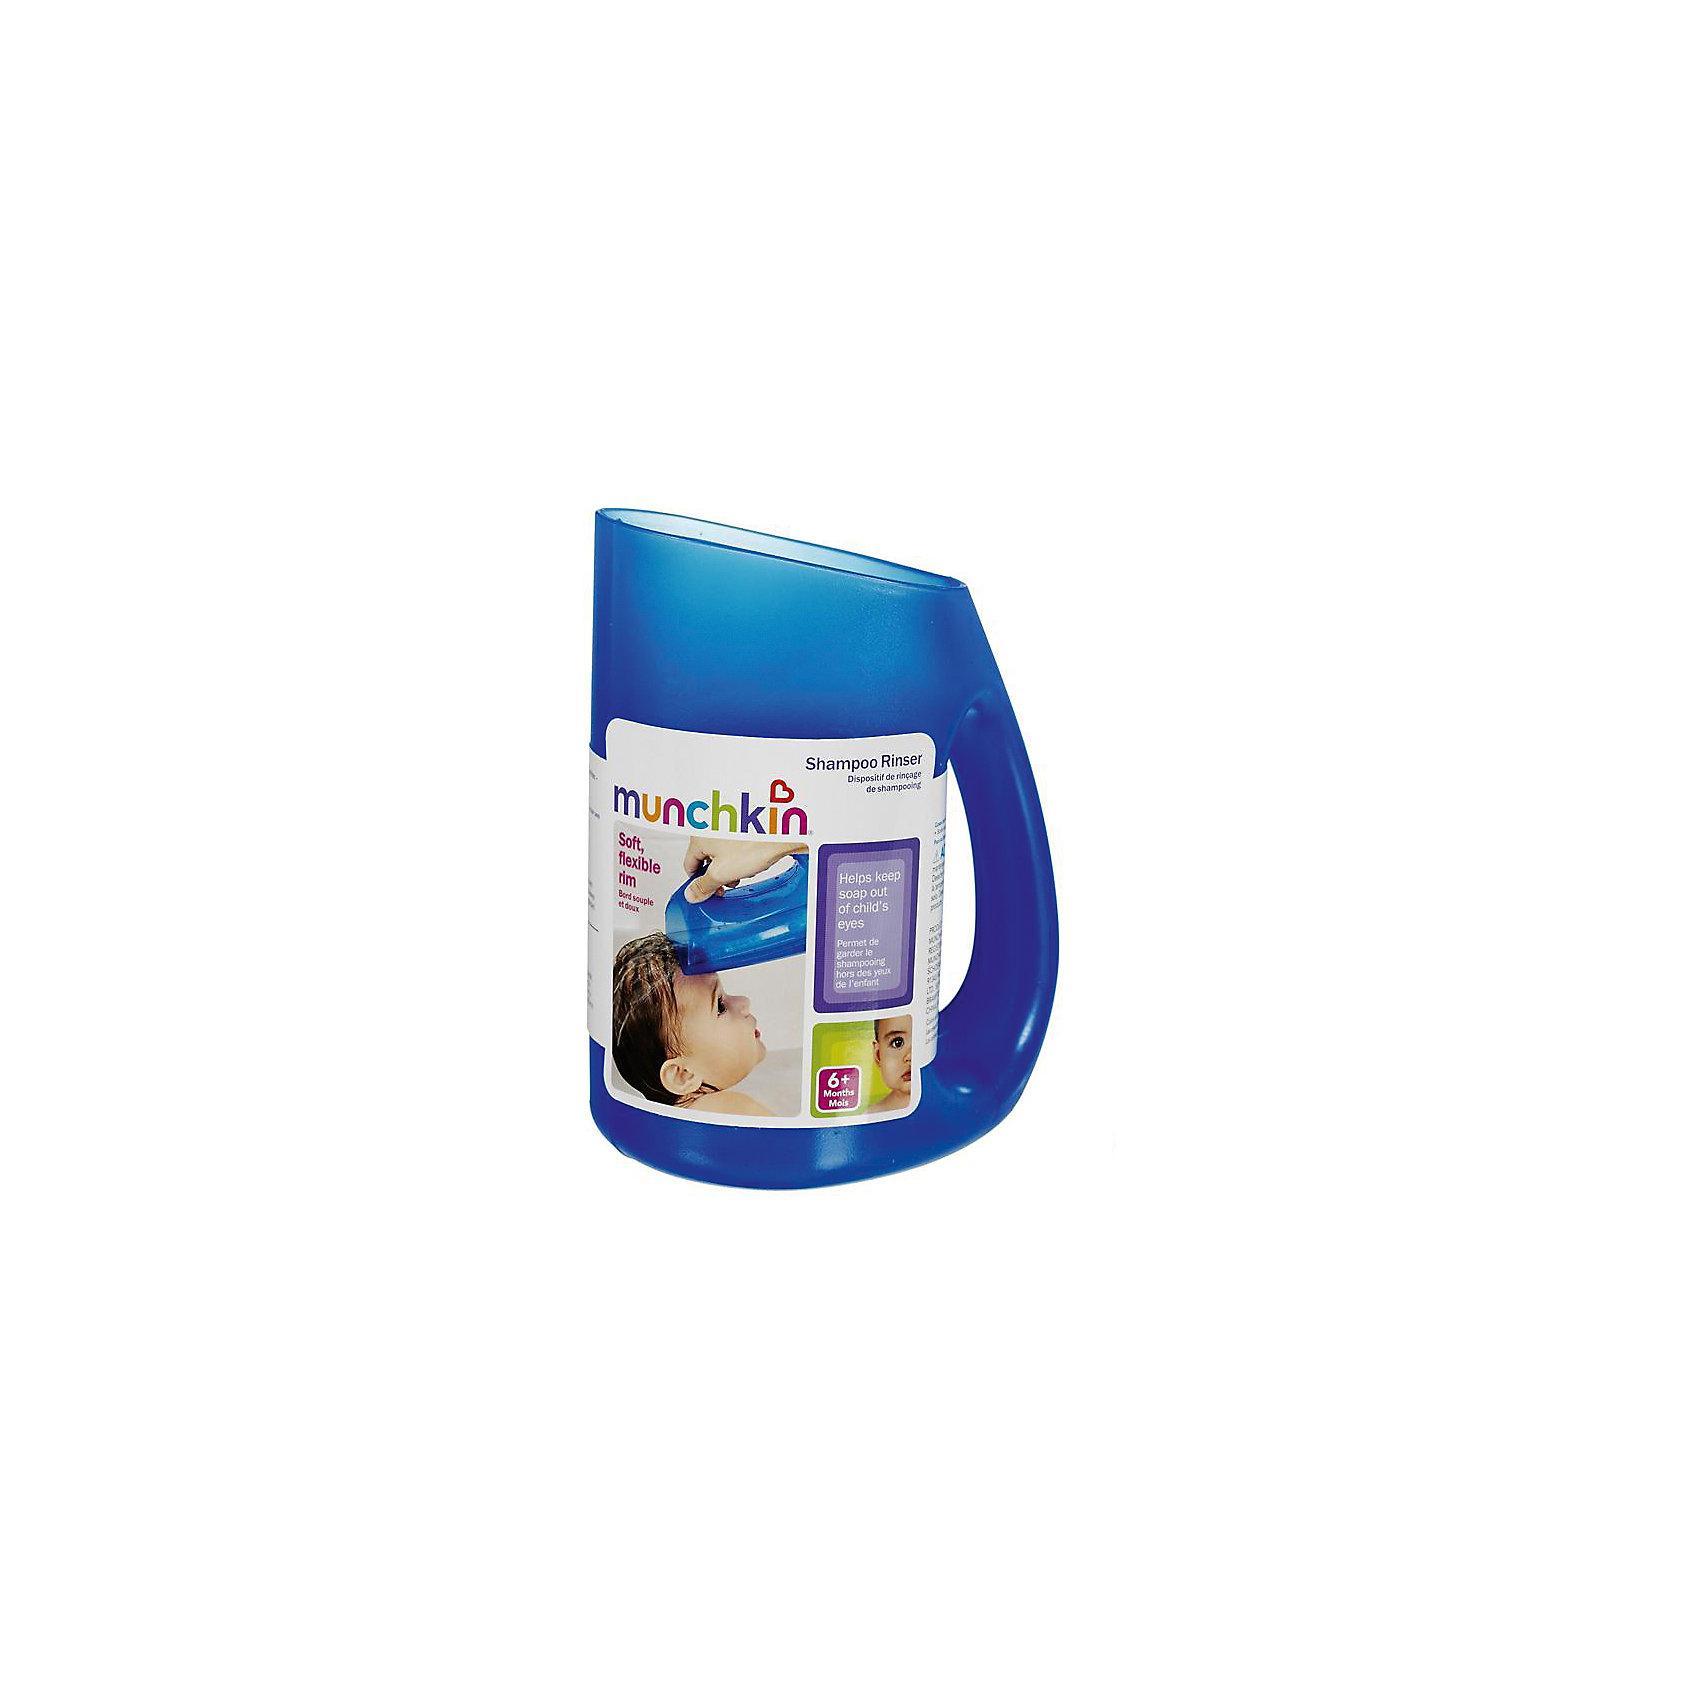 Мягкий кувшин для мытья волос с 6 мес, Munchkin, синий (munchkin)